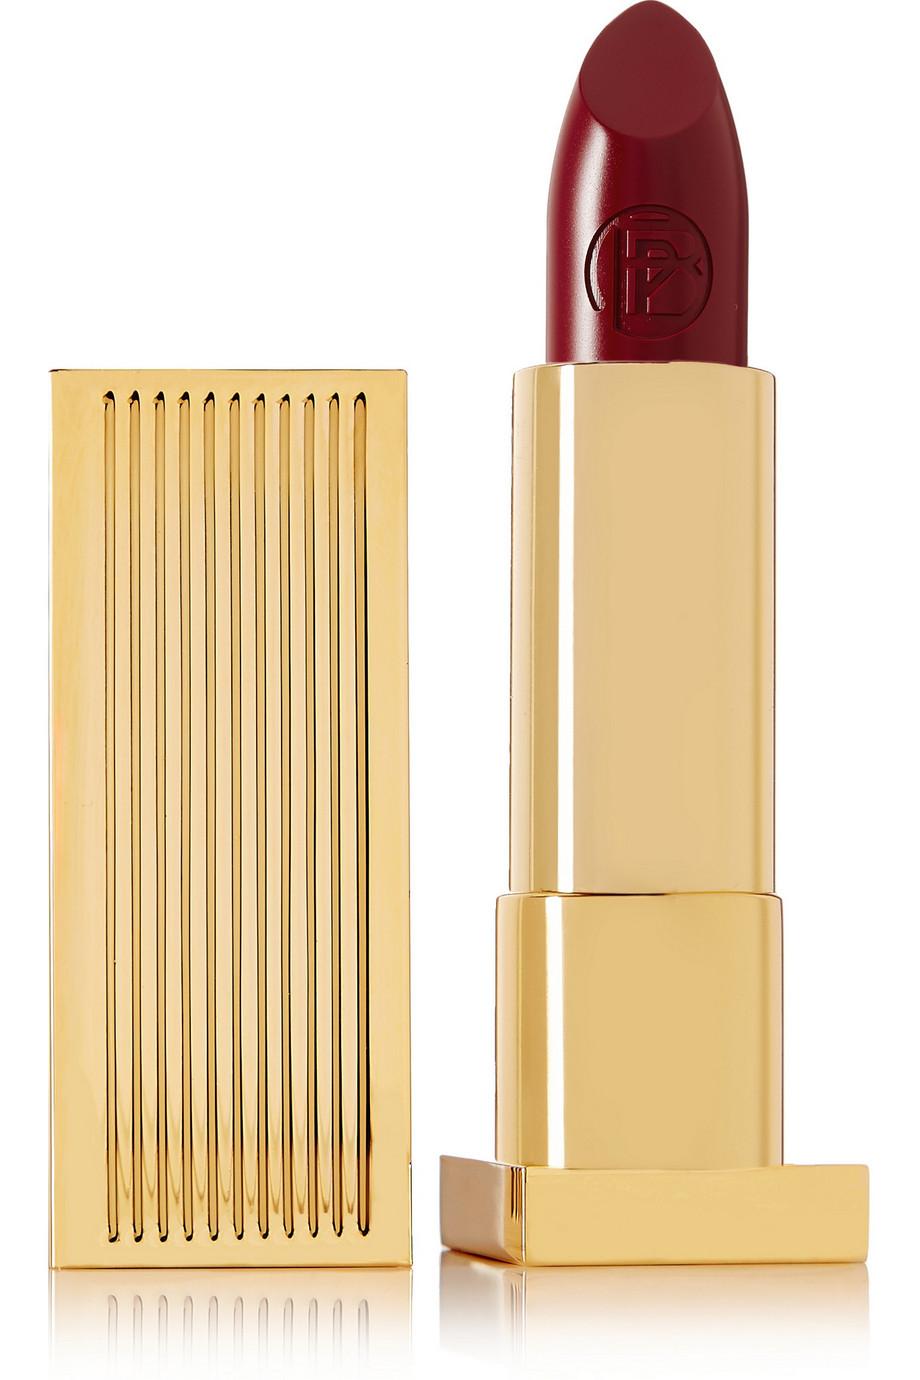 Velvet Rope Lipstick - Black Tie, by Lipstick Queen